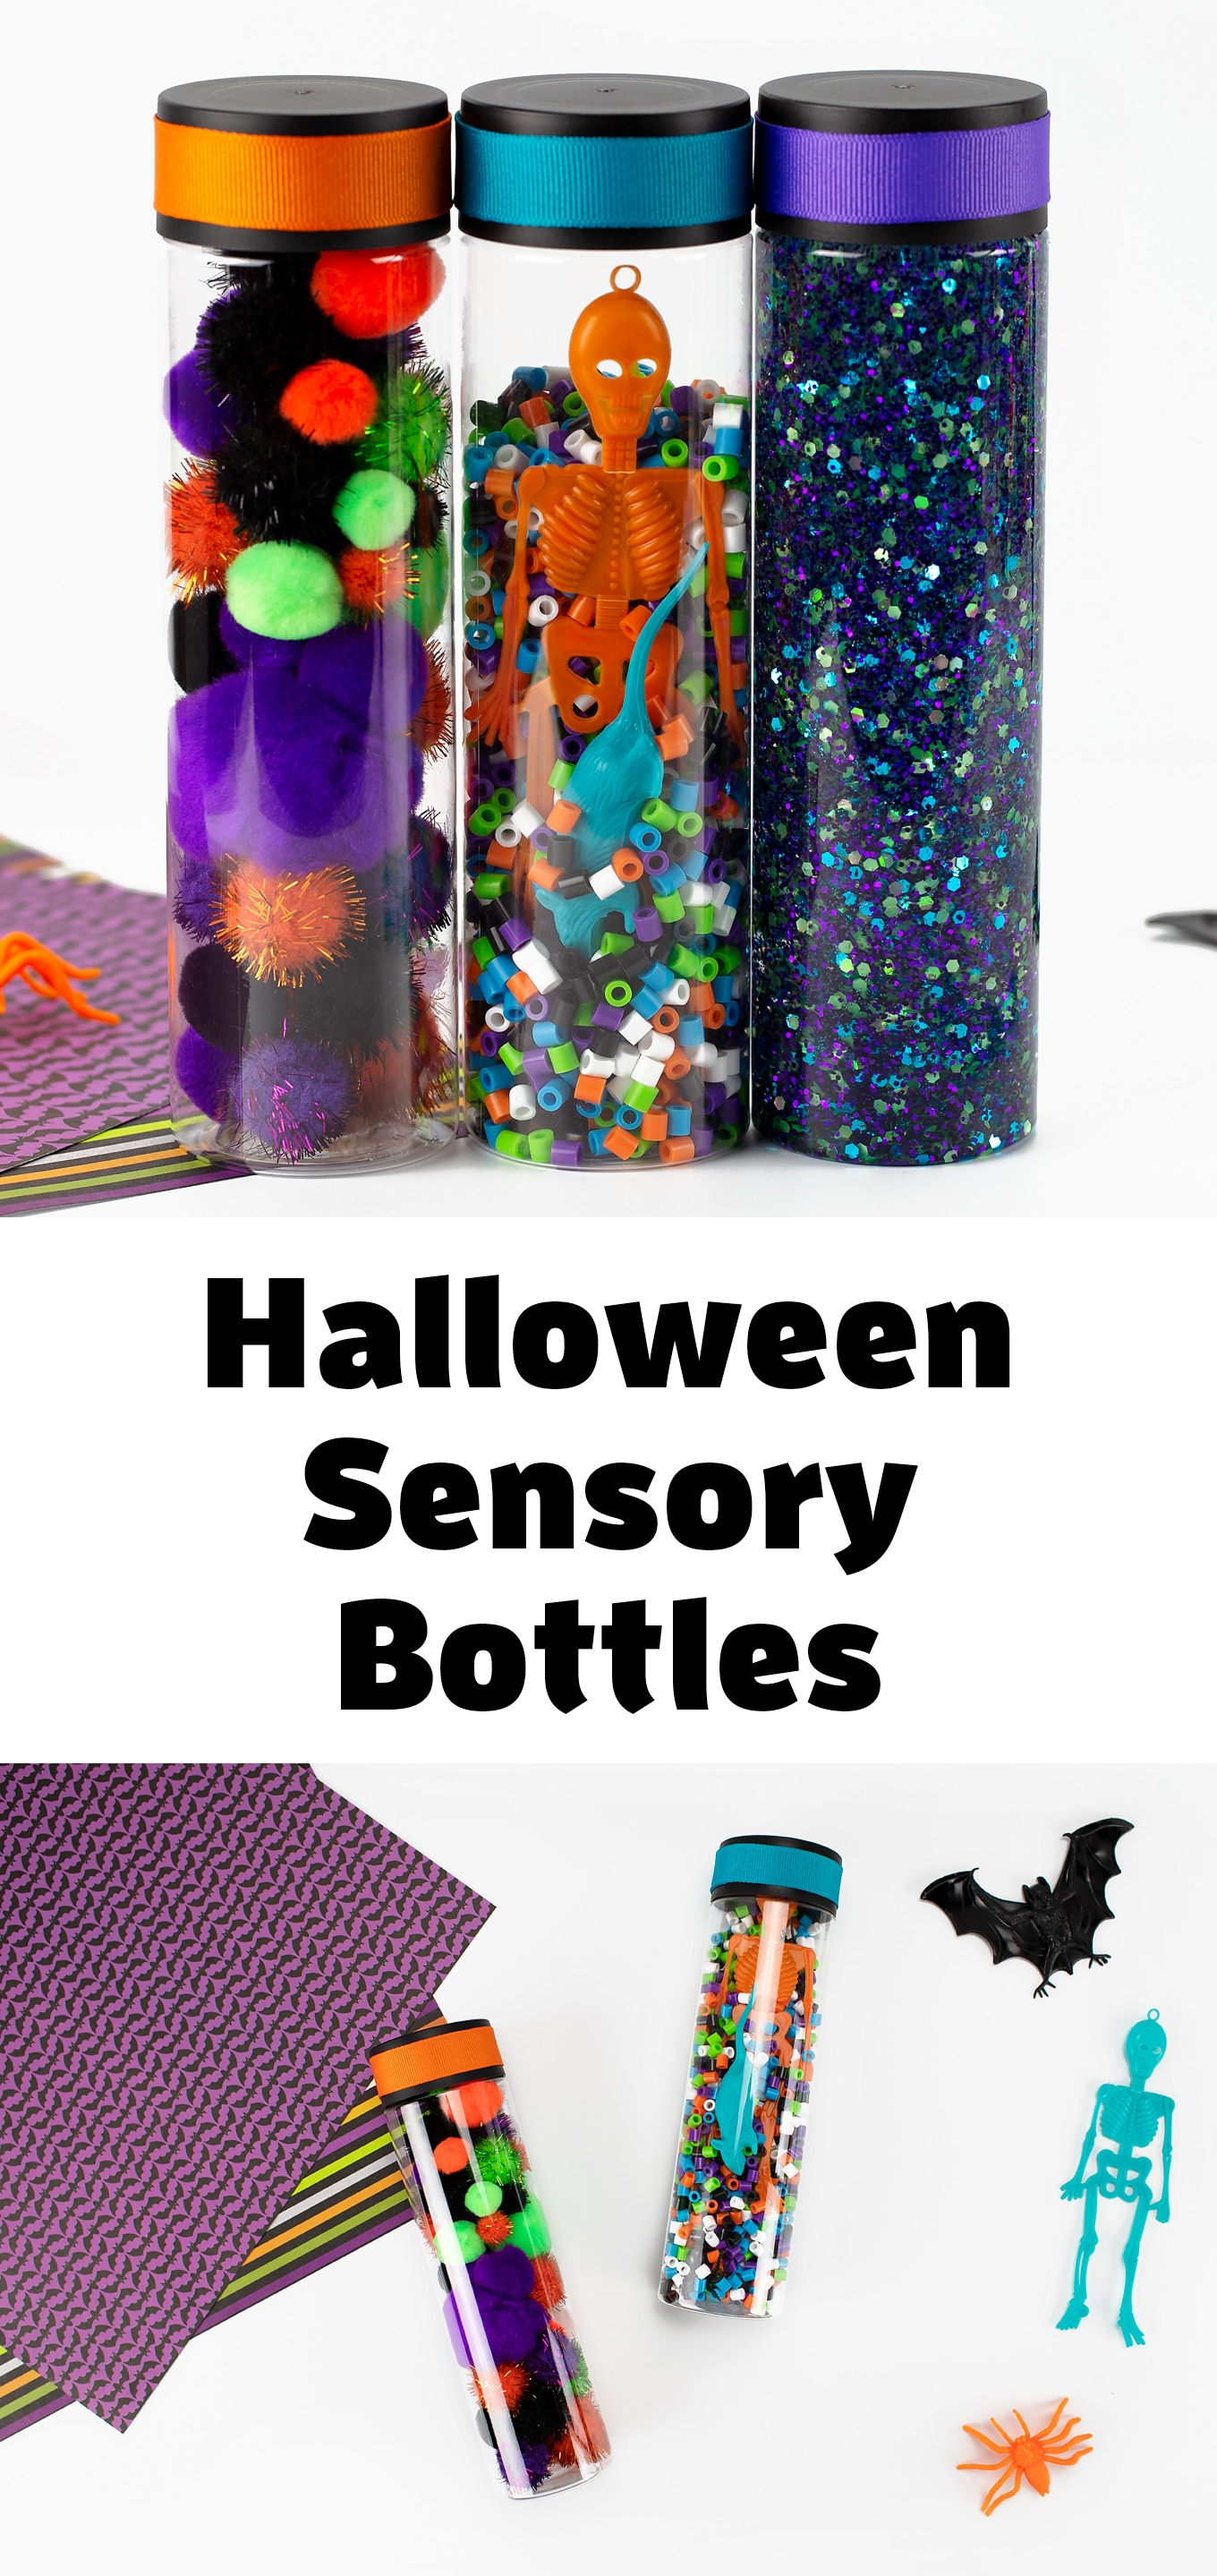 October is the perfect month to make DIY sensory bottles for kids! Our set of 3 Halloween Sensory Bottles is colorful, engaging, and fun! #firefliesandmudpies #halloweensensorybottles #preschool #kids #diy #toddlers via @firefliesandmudpies